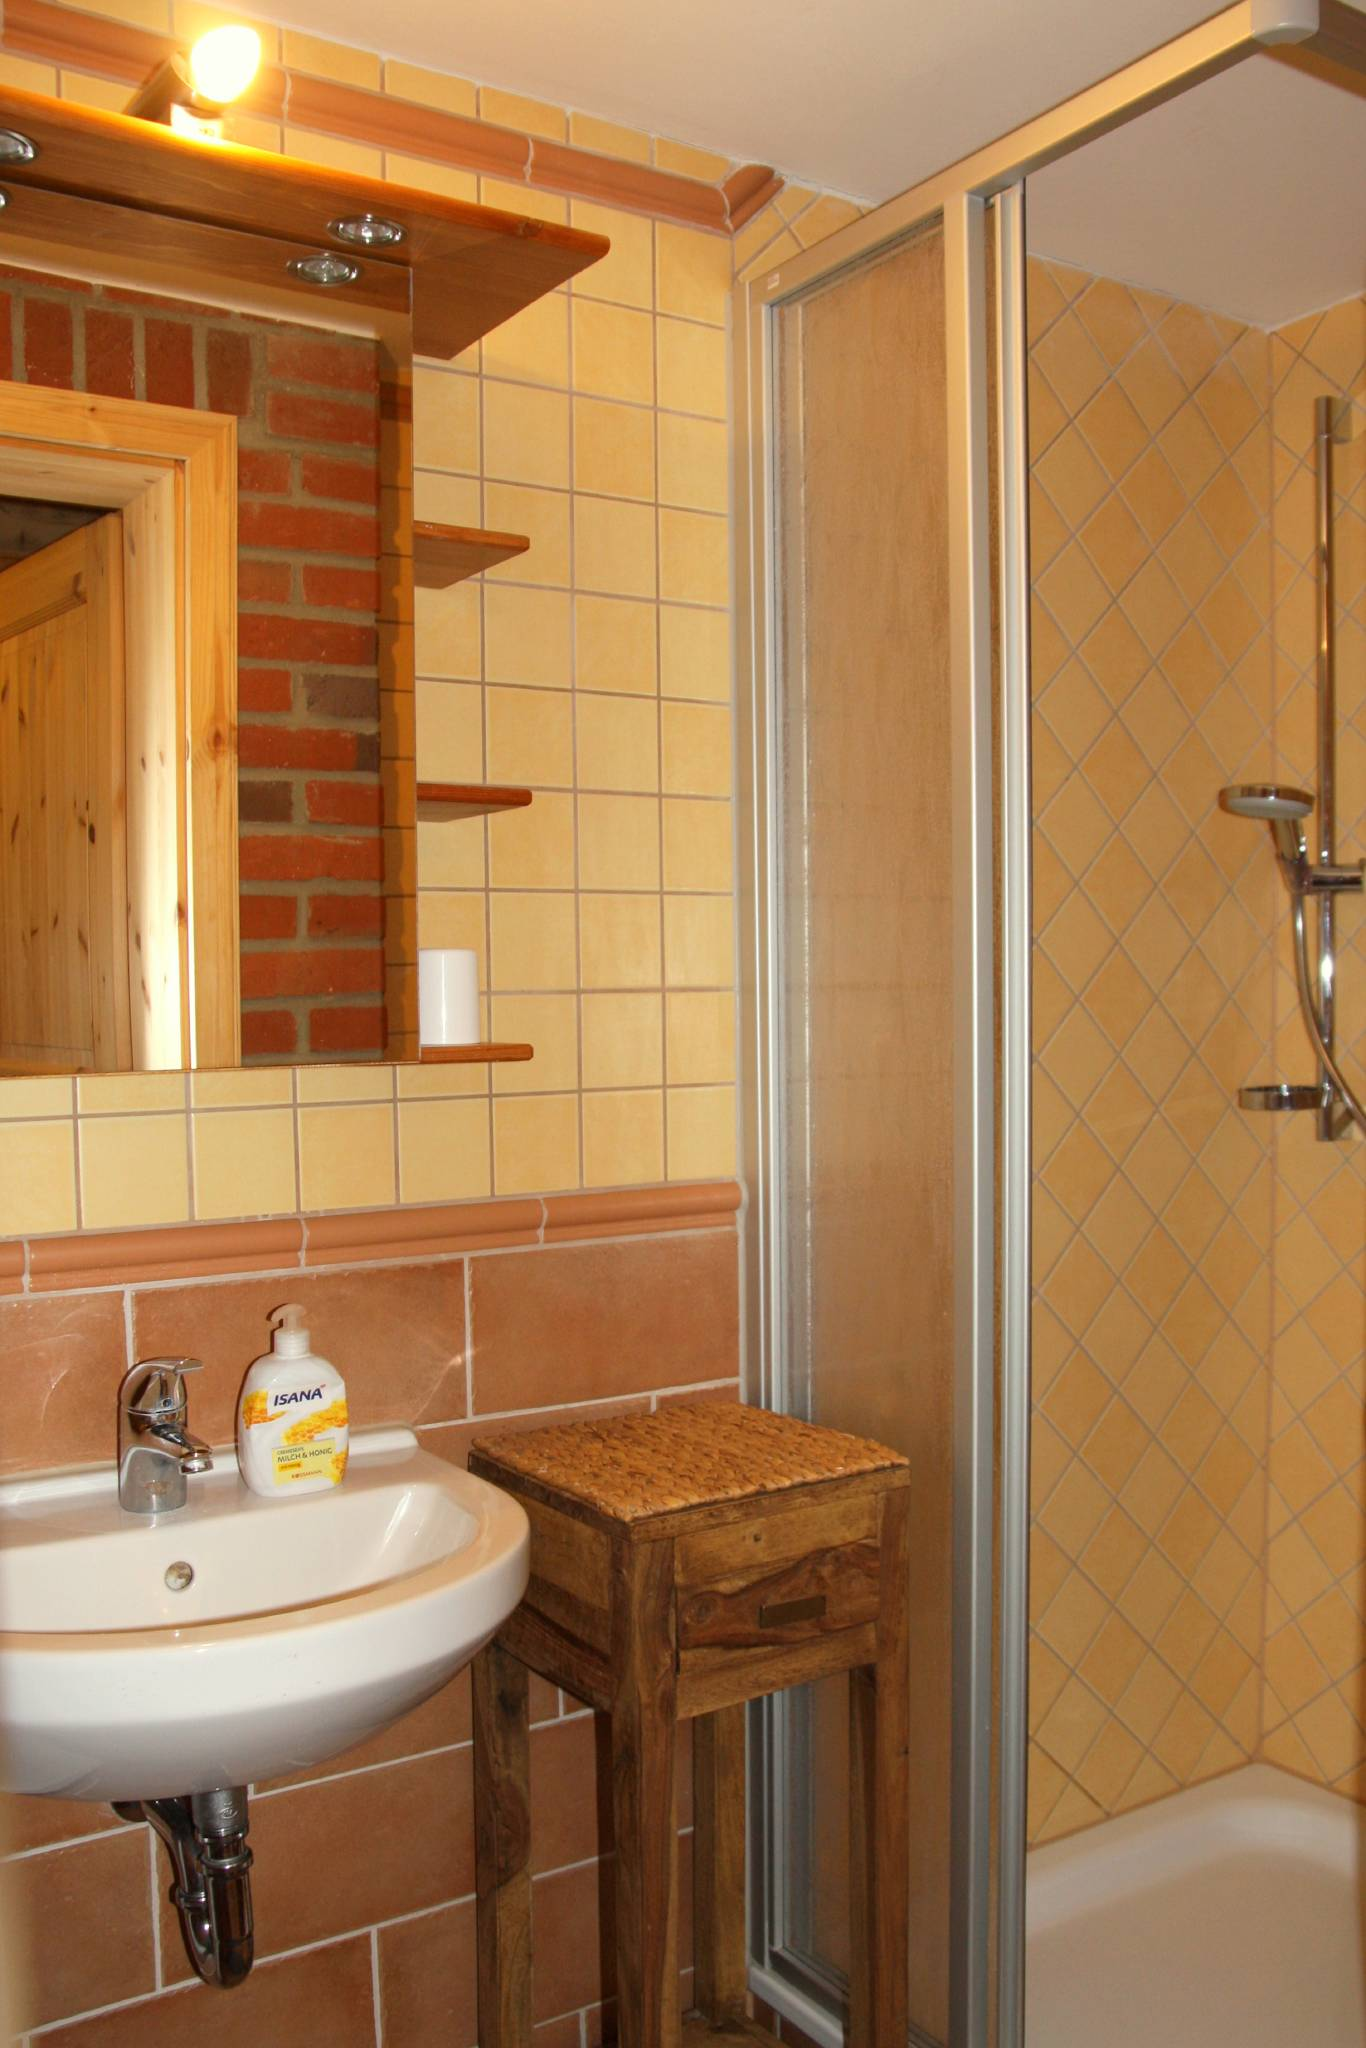 PROVENCE - Bad mit Fenster/Dusche/WC